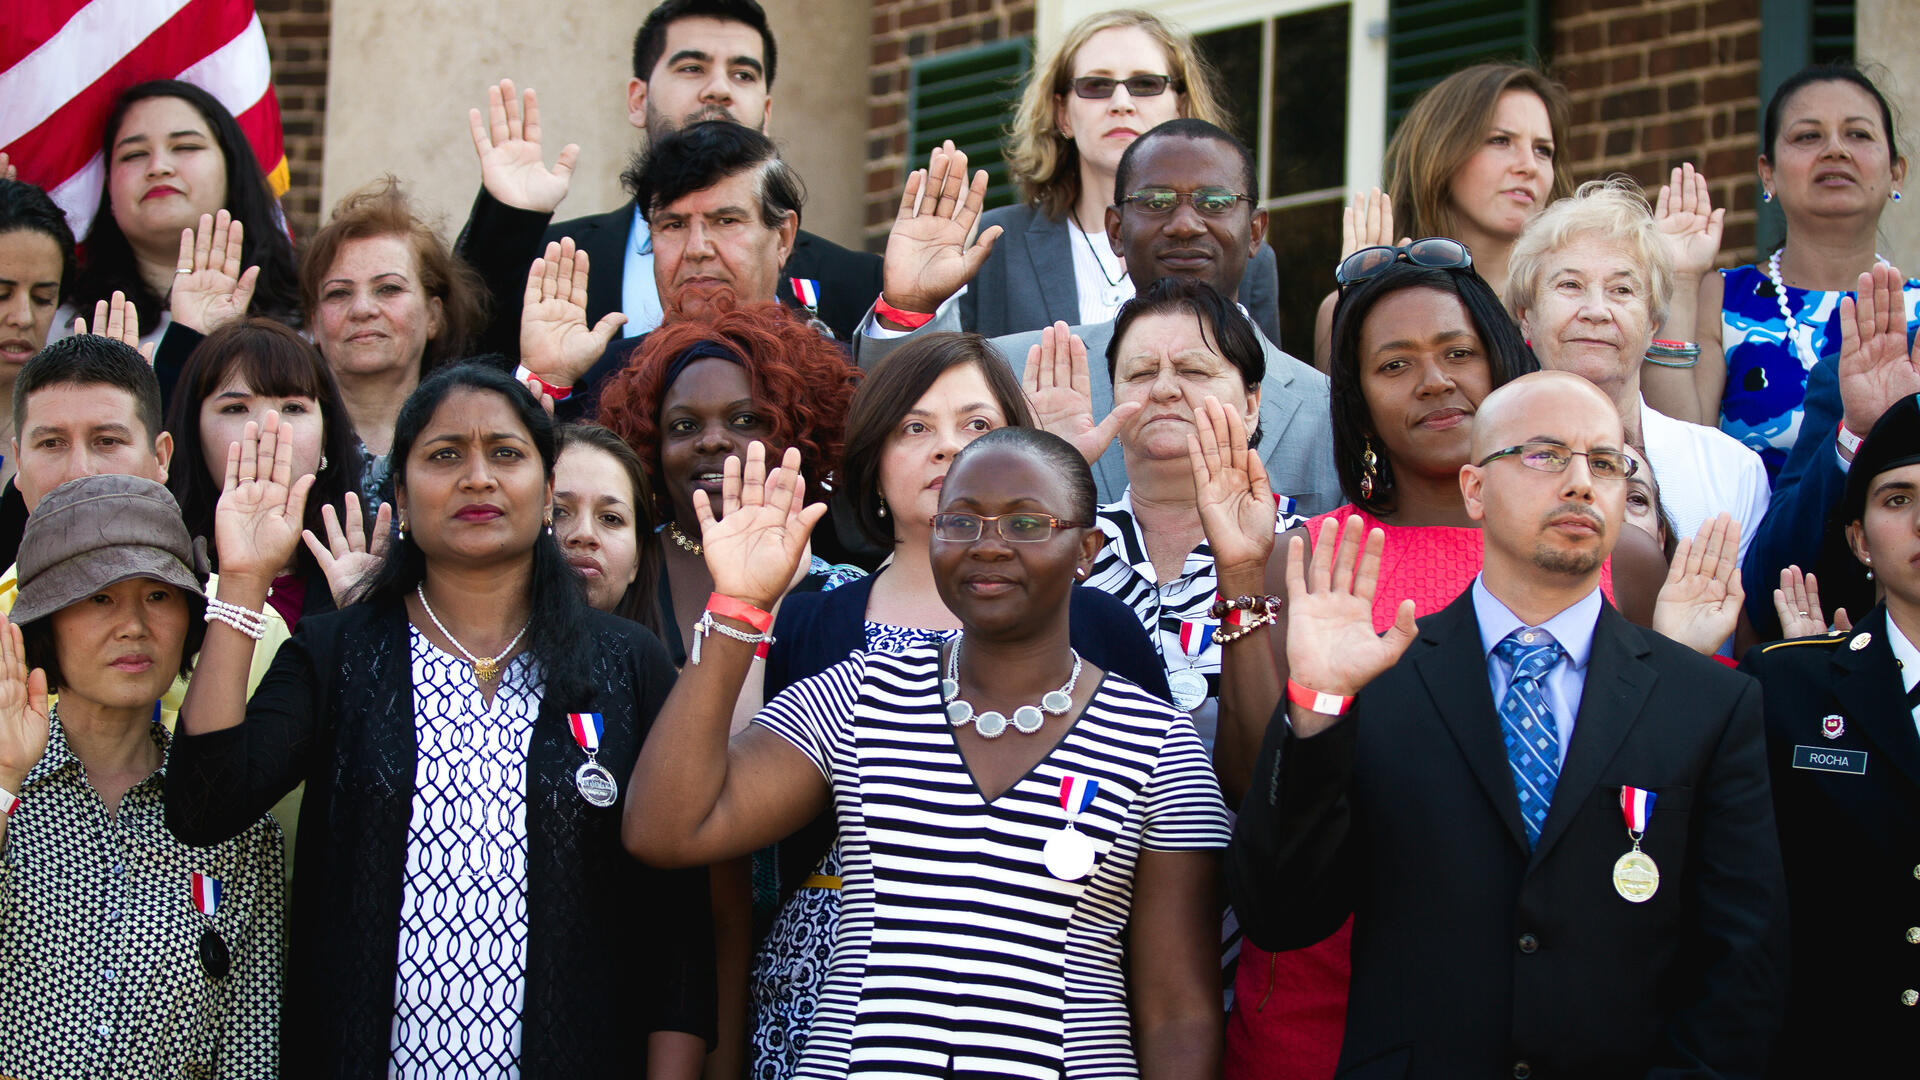 New U.S. citizens taking an oath